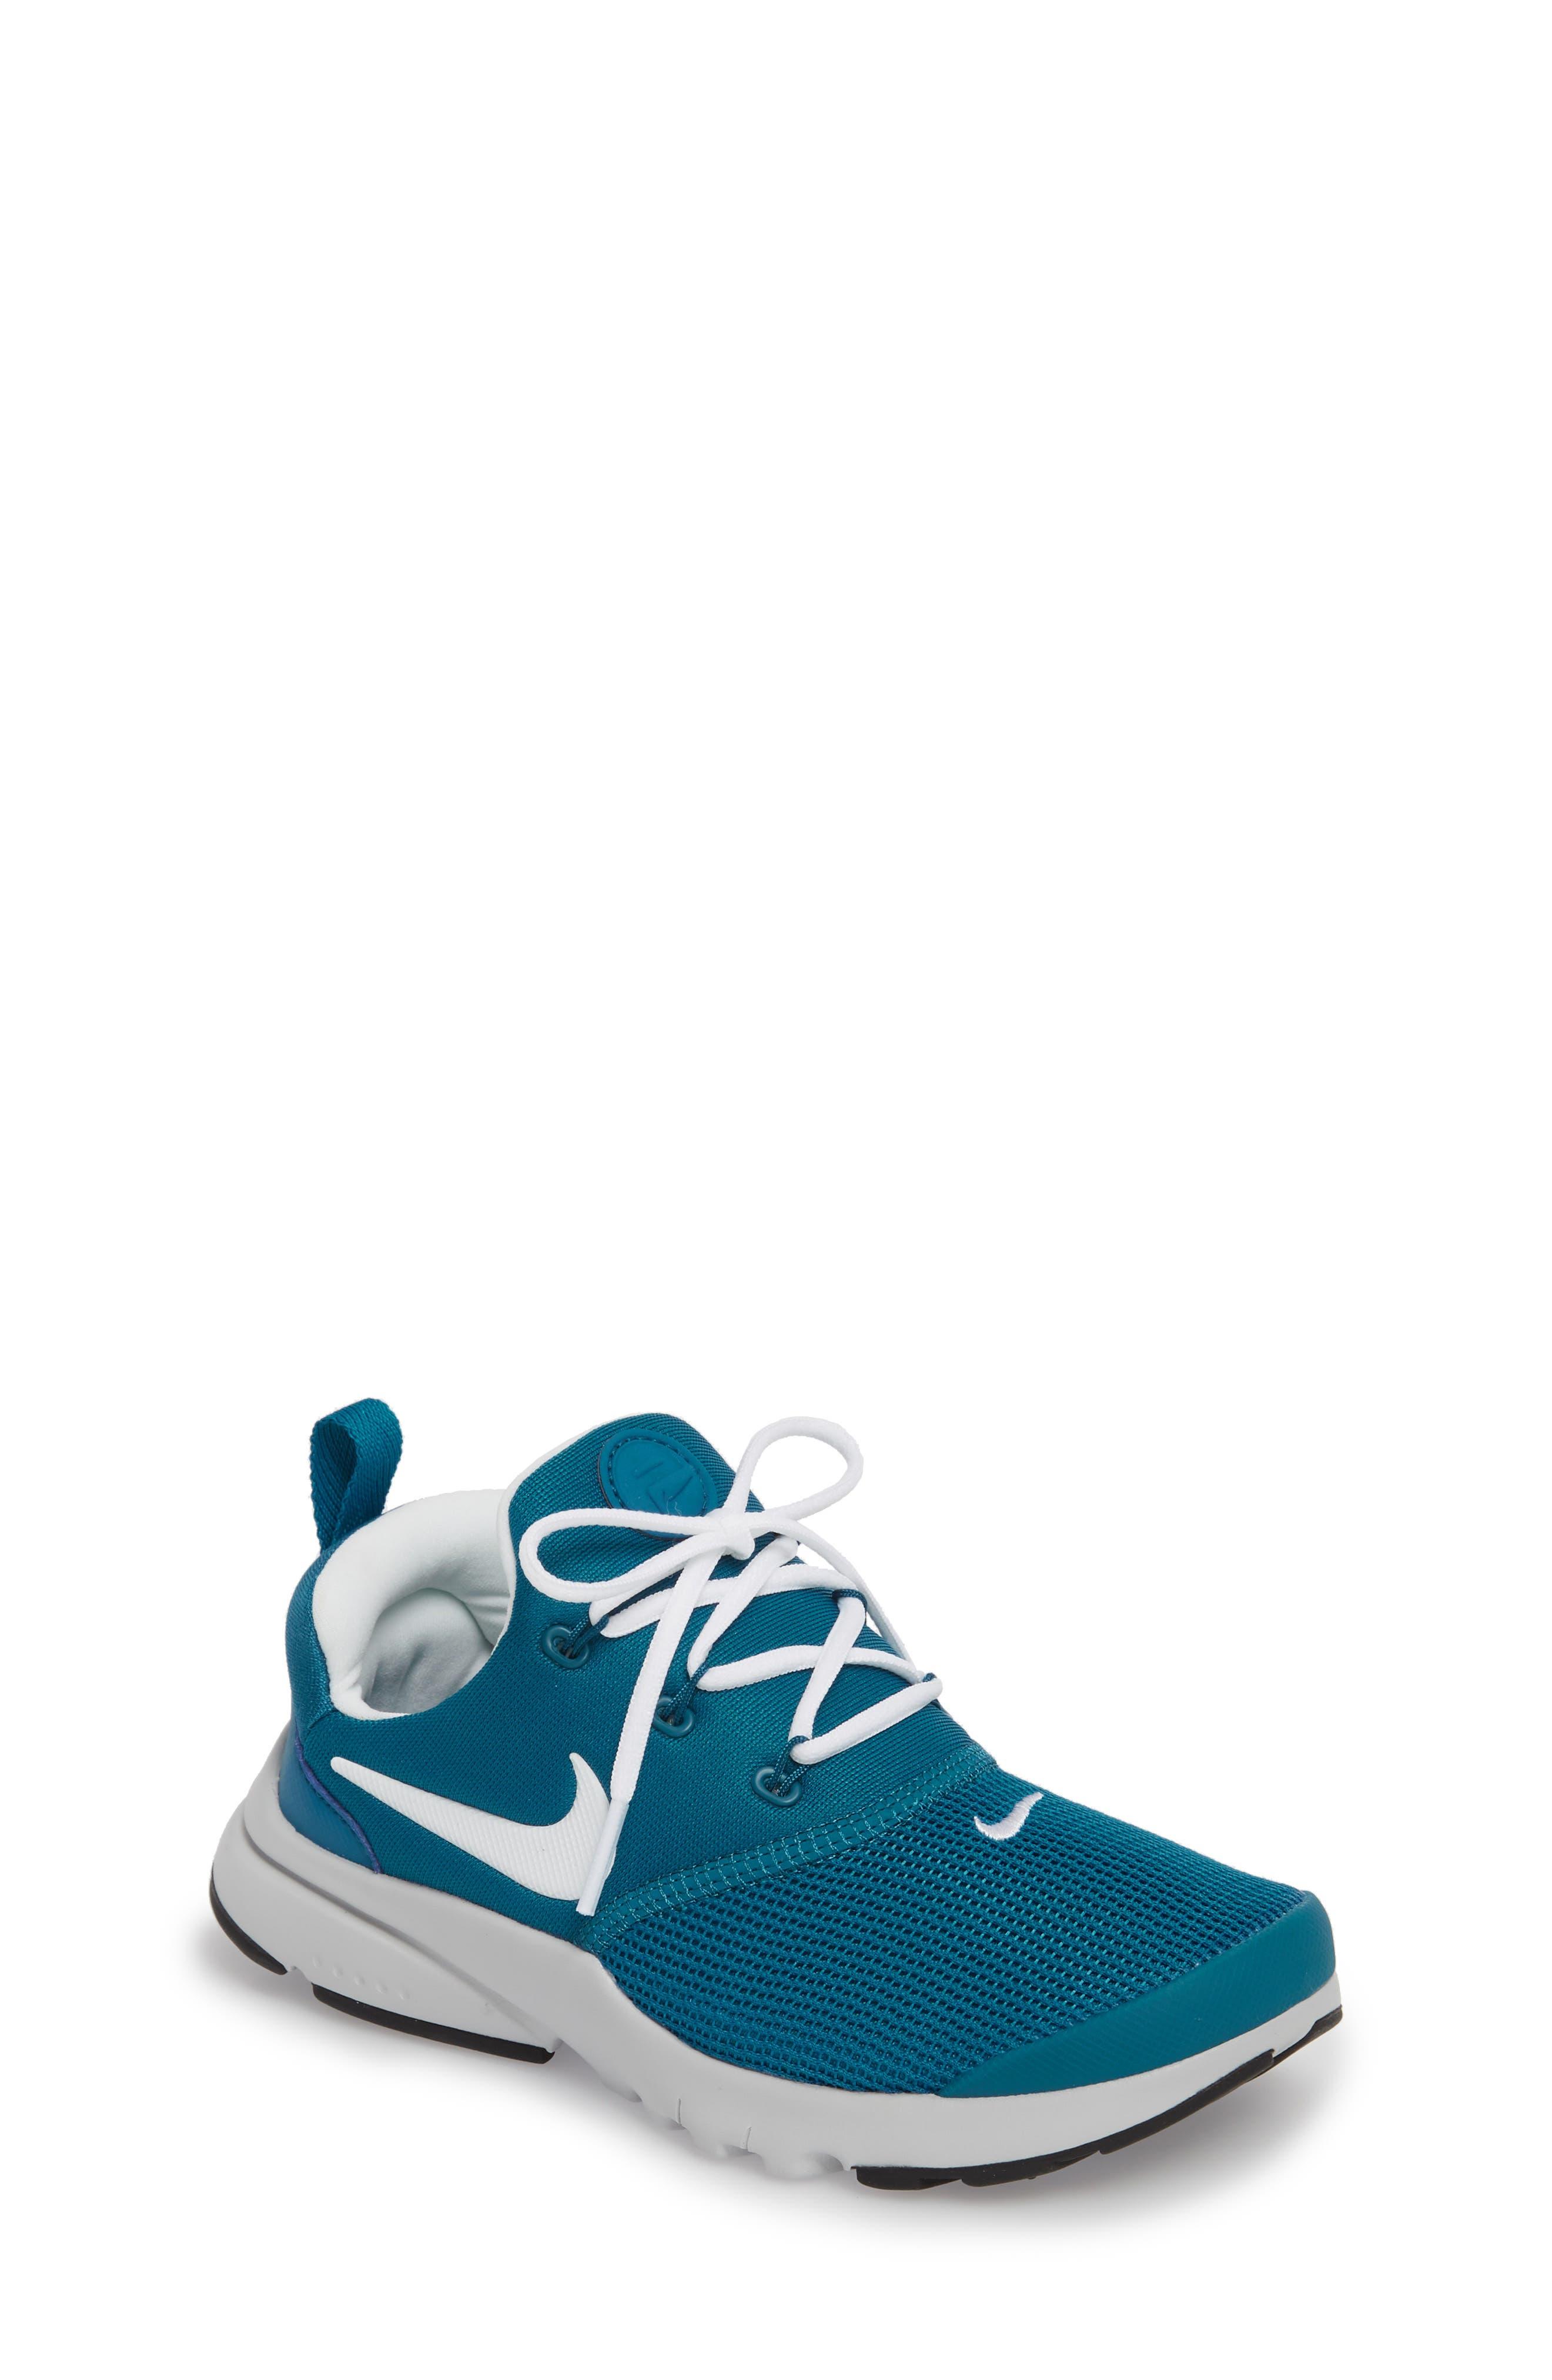 Presto Fly Sneaker,                             Main thumbnail 1, color,                             440